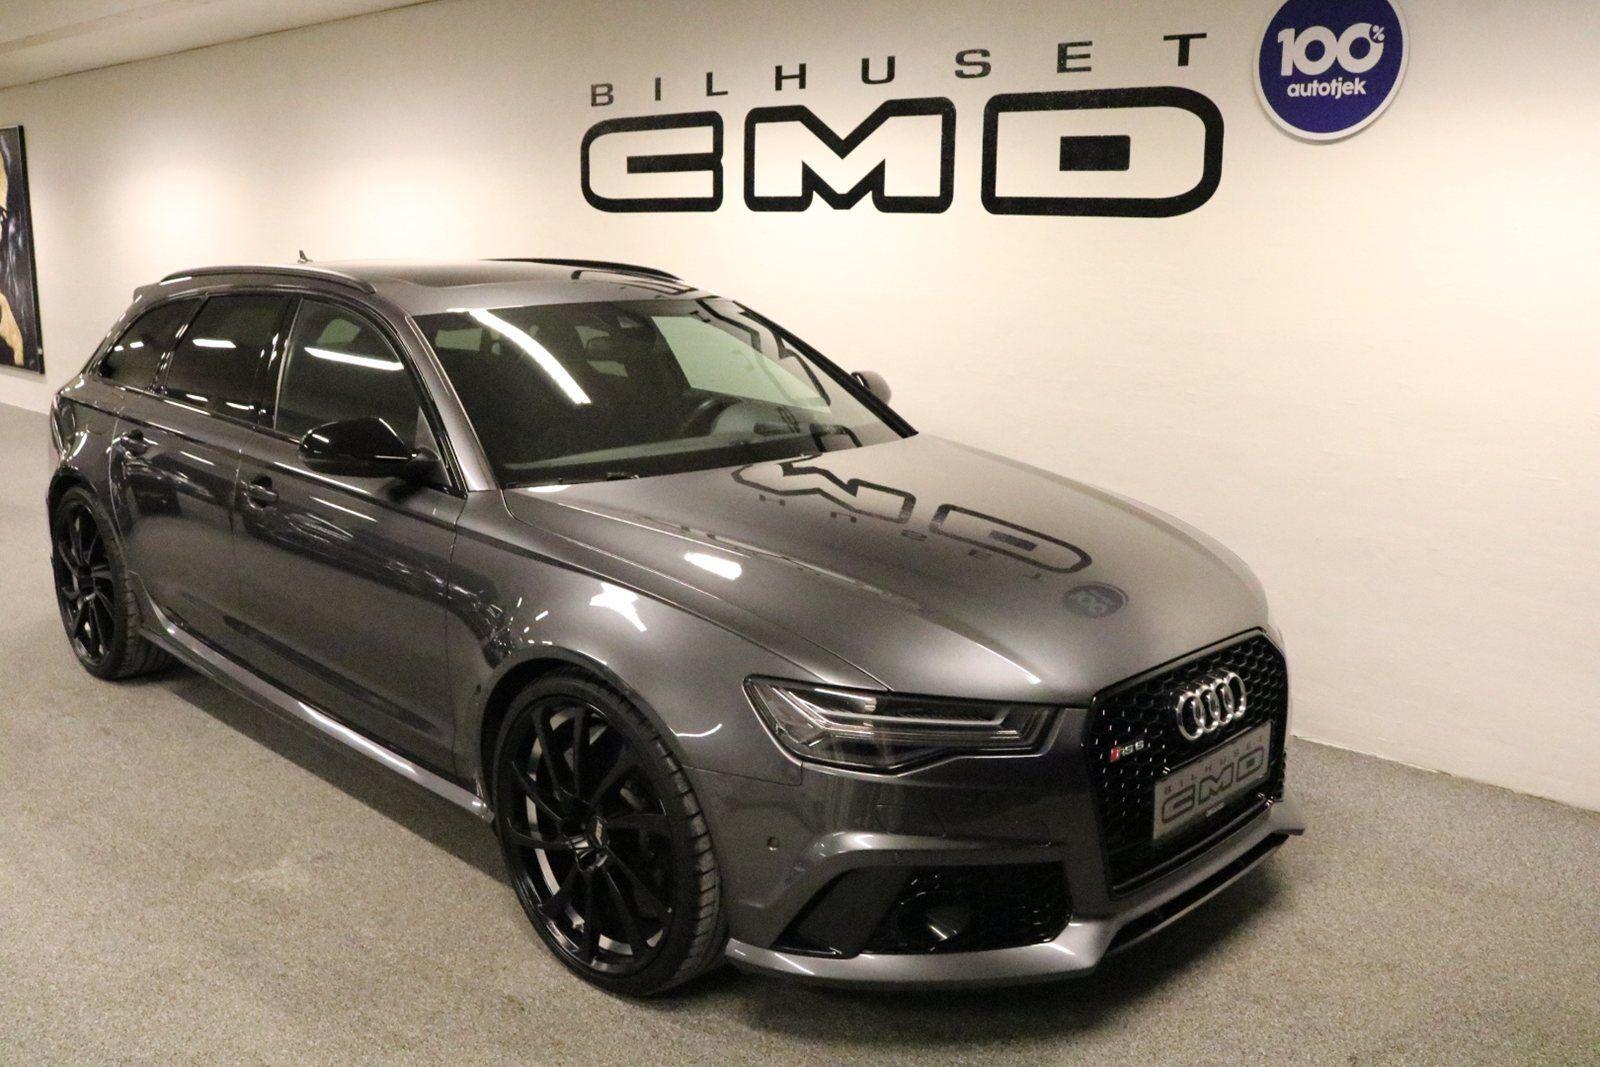 Audi RS6 4,0 TFSi Avant quattro Tiptr. 5d - 0 kr.